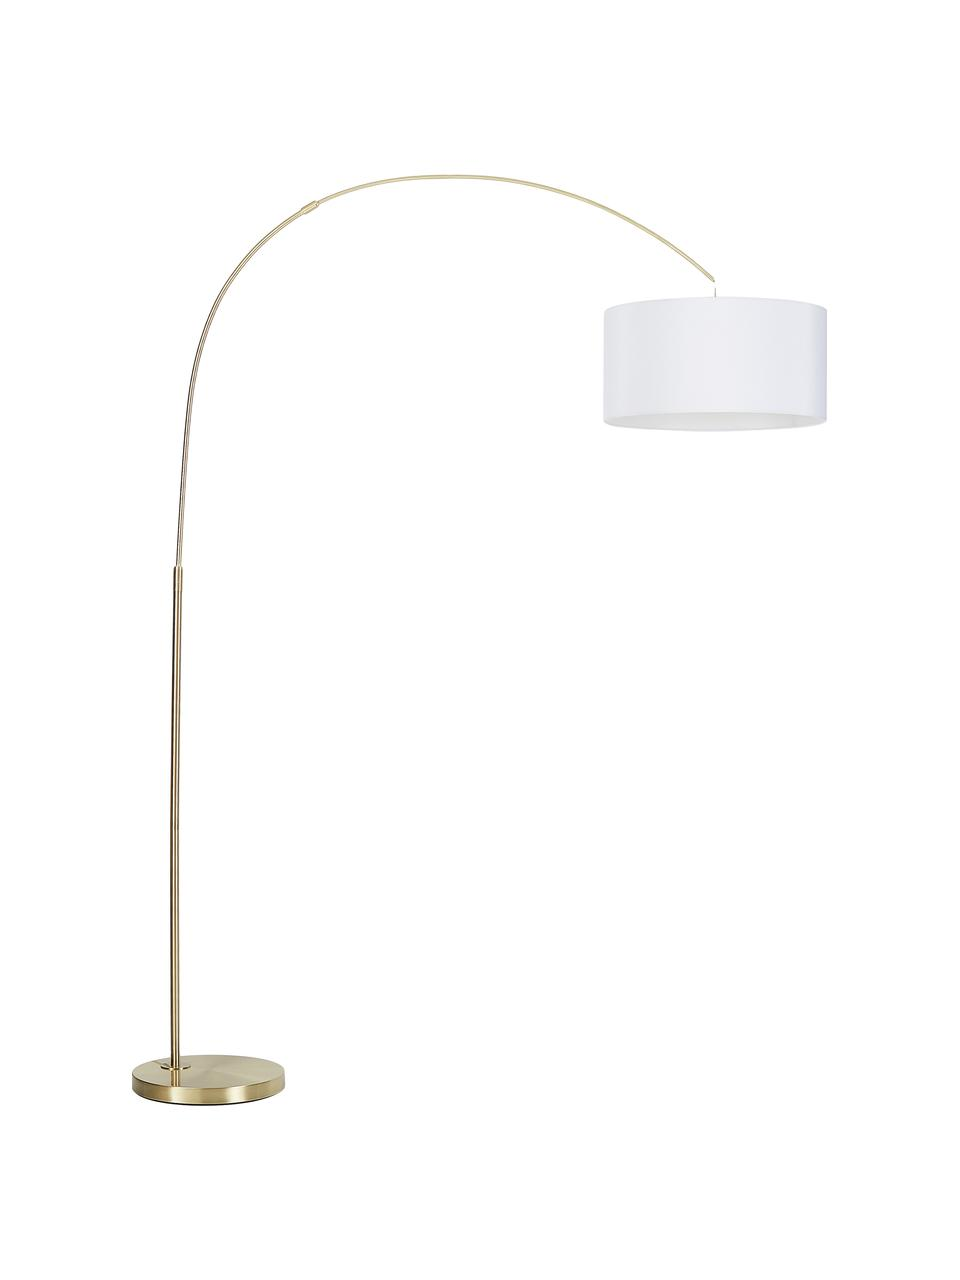 Moderne Bogenlampe Niels in Messing, Lampenschirm: Baumwollgemisch, Lampenfuß: Metall, gebürstet, Lampenschirm: WeißLampenfuß: MessingfarbenKabel: Transparent, 157 x 218 cm